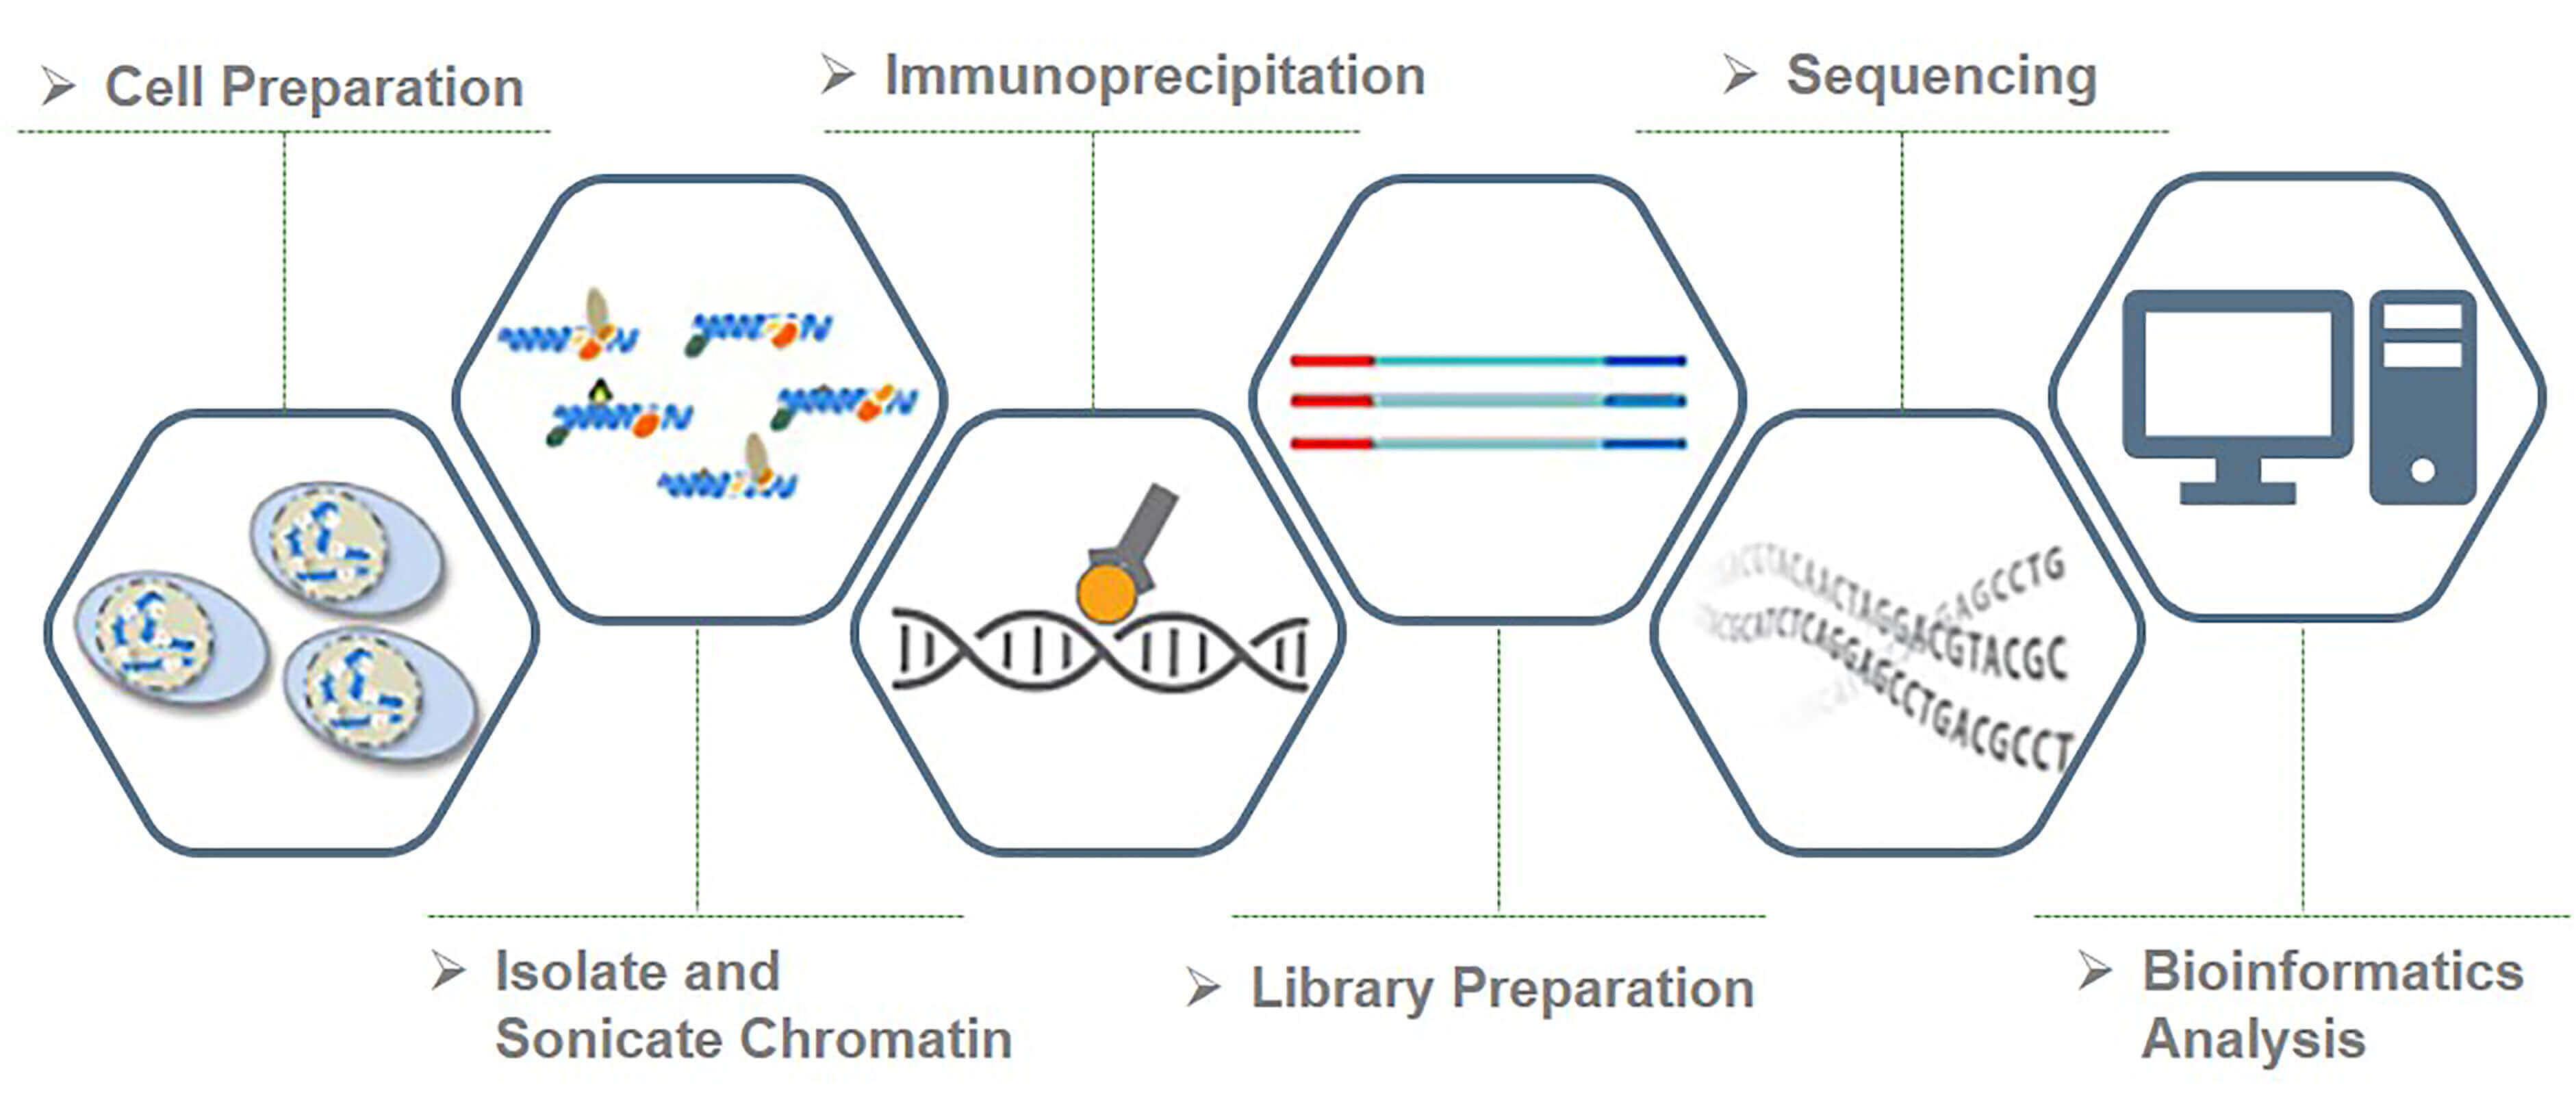 Workflow of Transcription Factor (TF) ChIP-Seq service at Creative BioMart